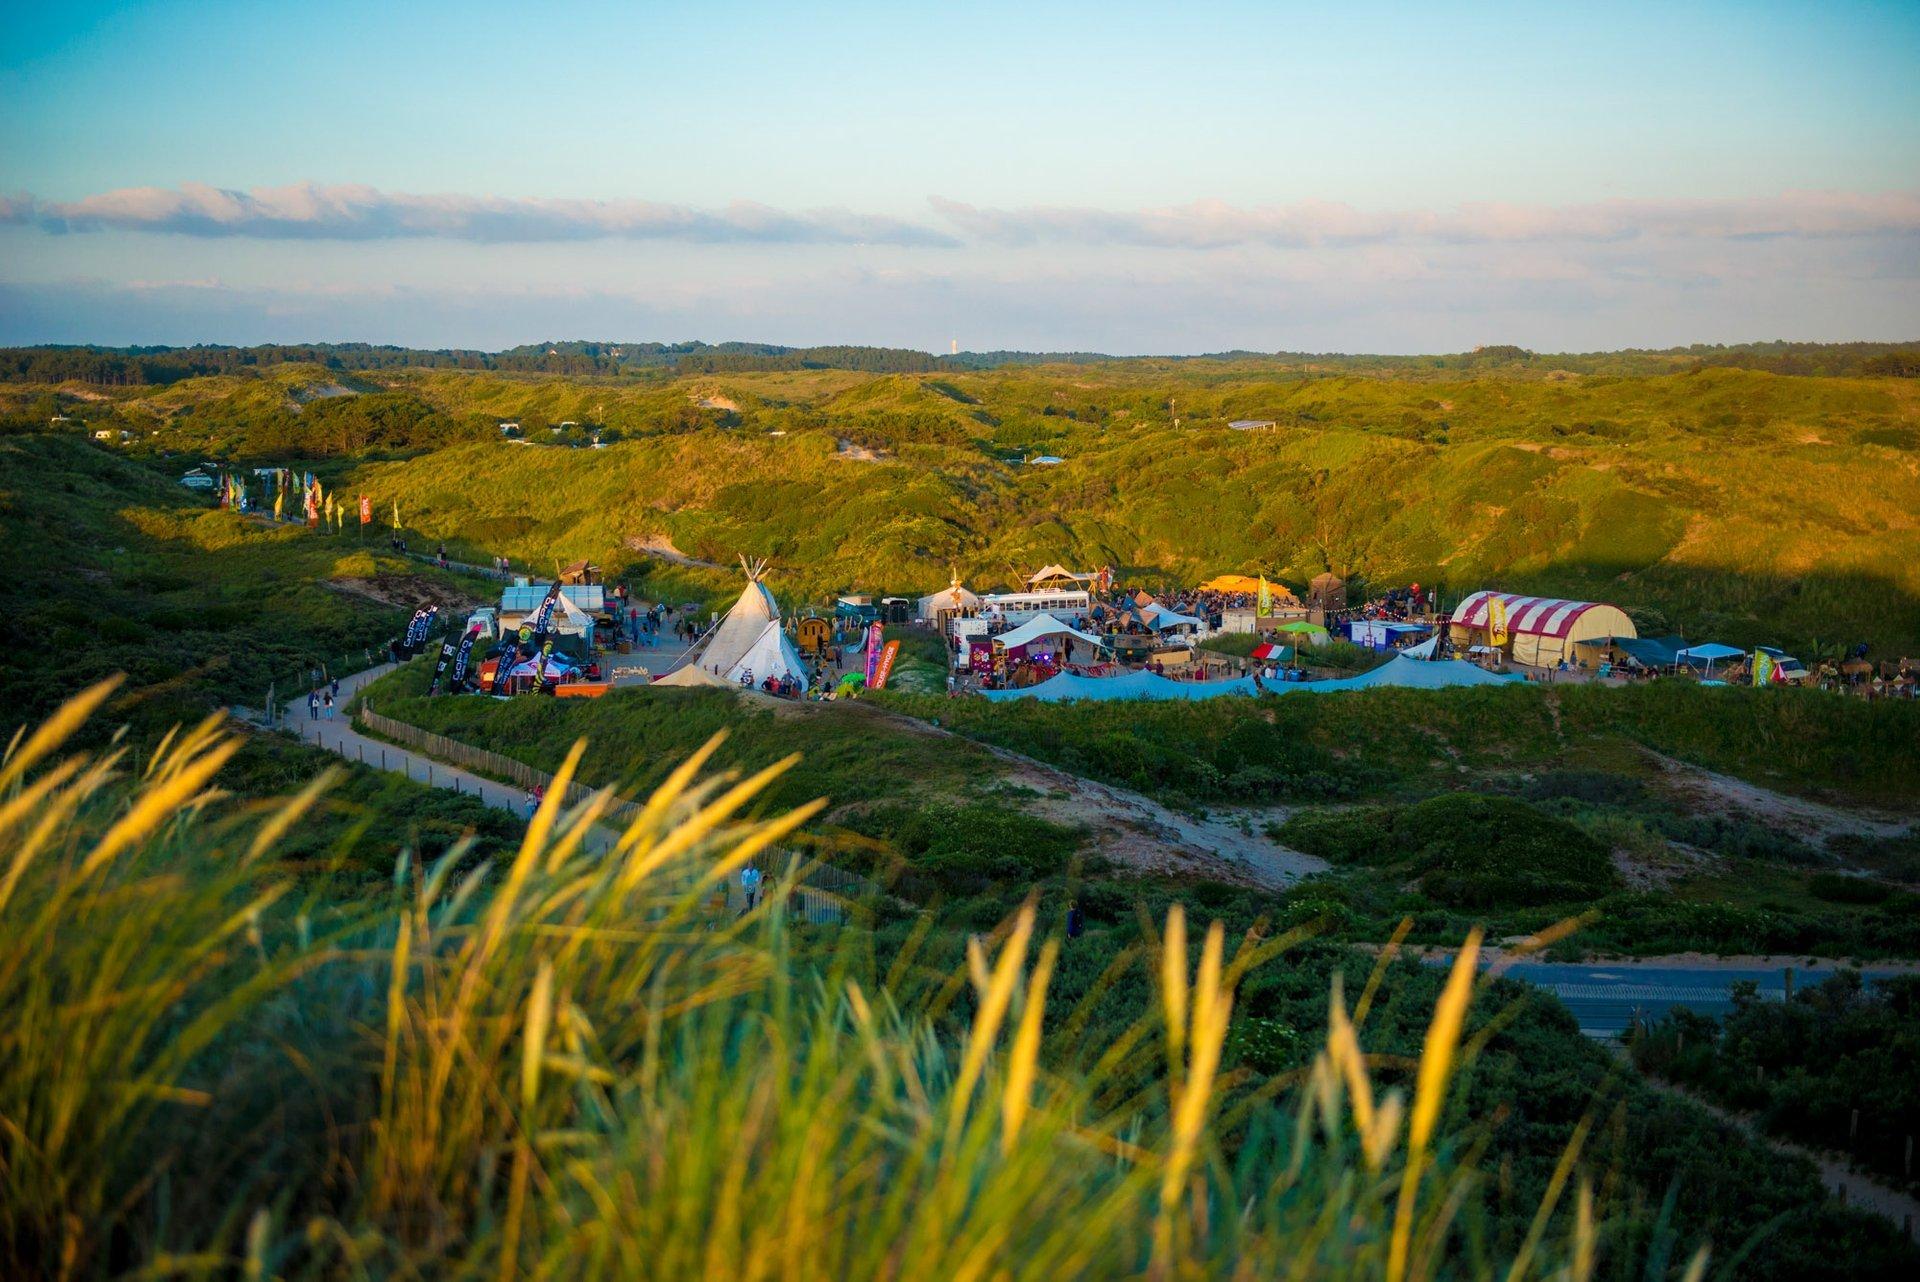 Surfana Festival in The Netherlands - Best Season 2020